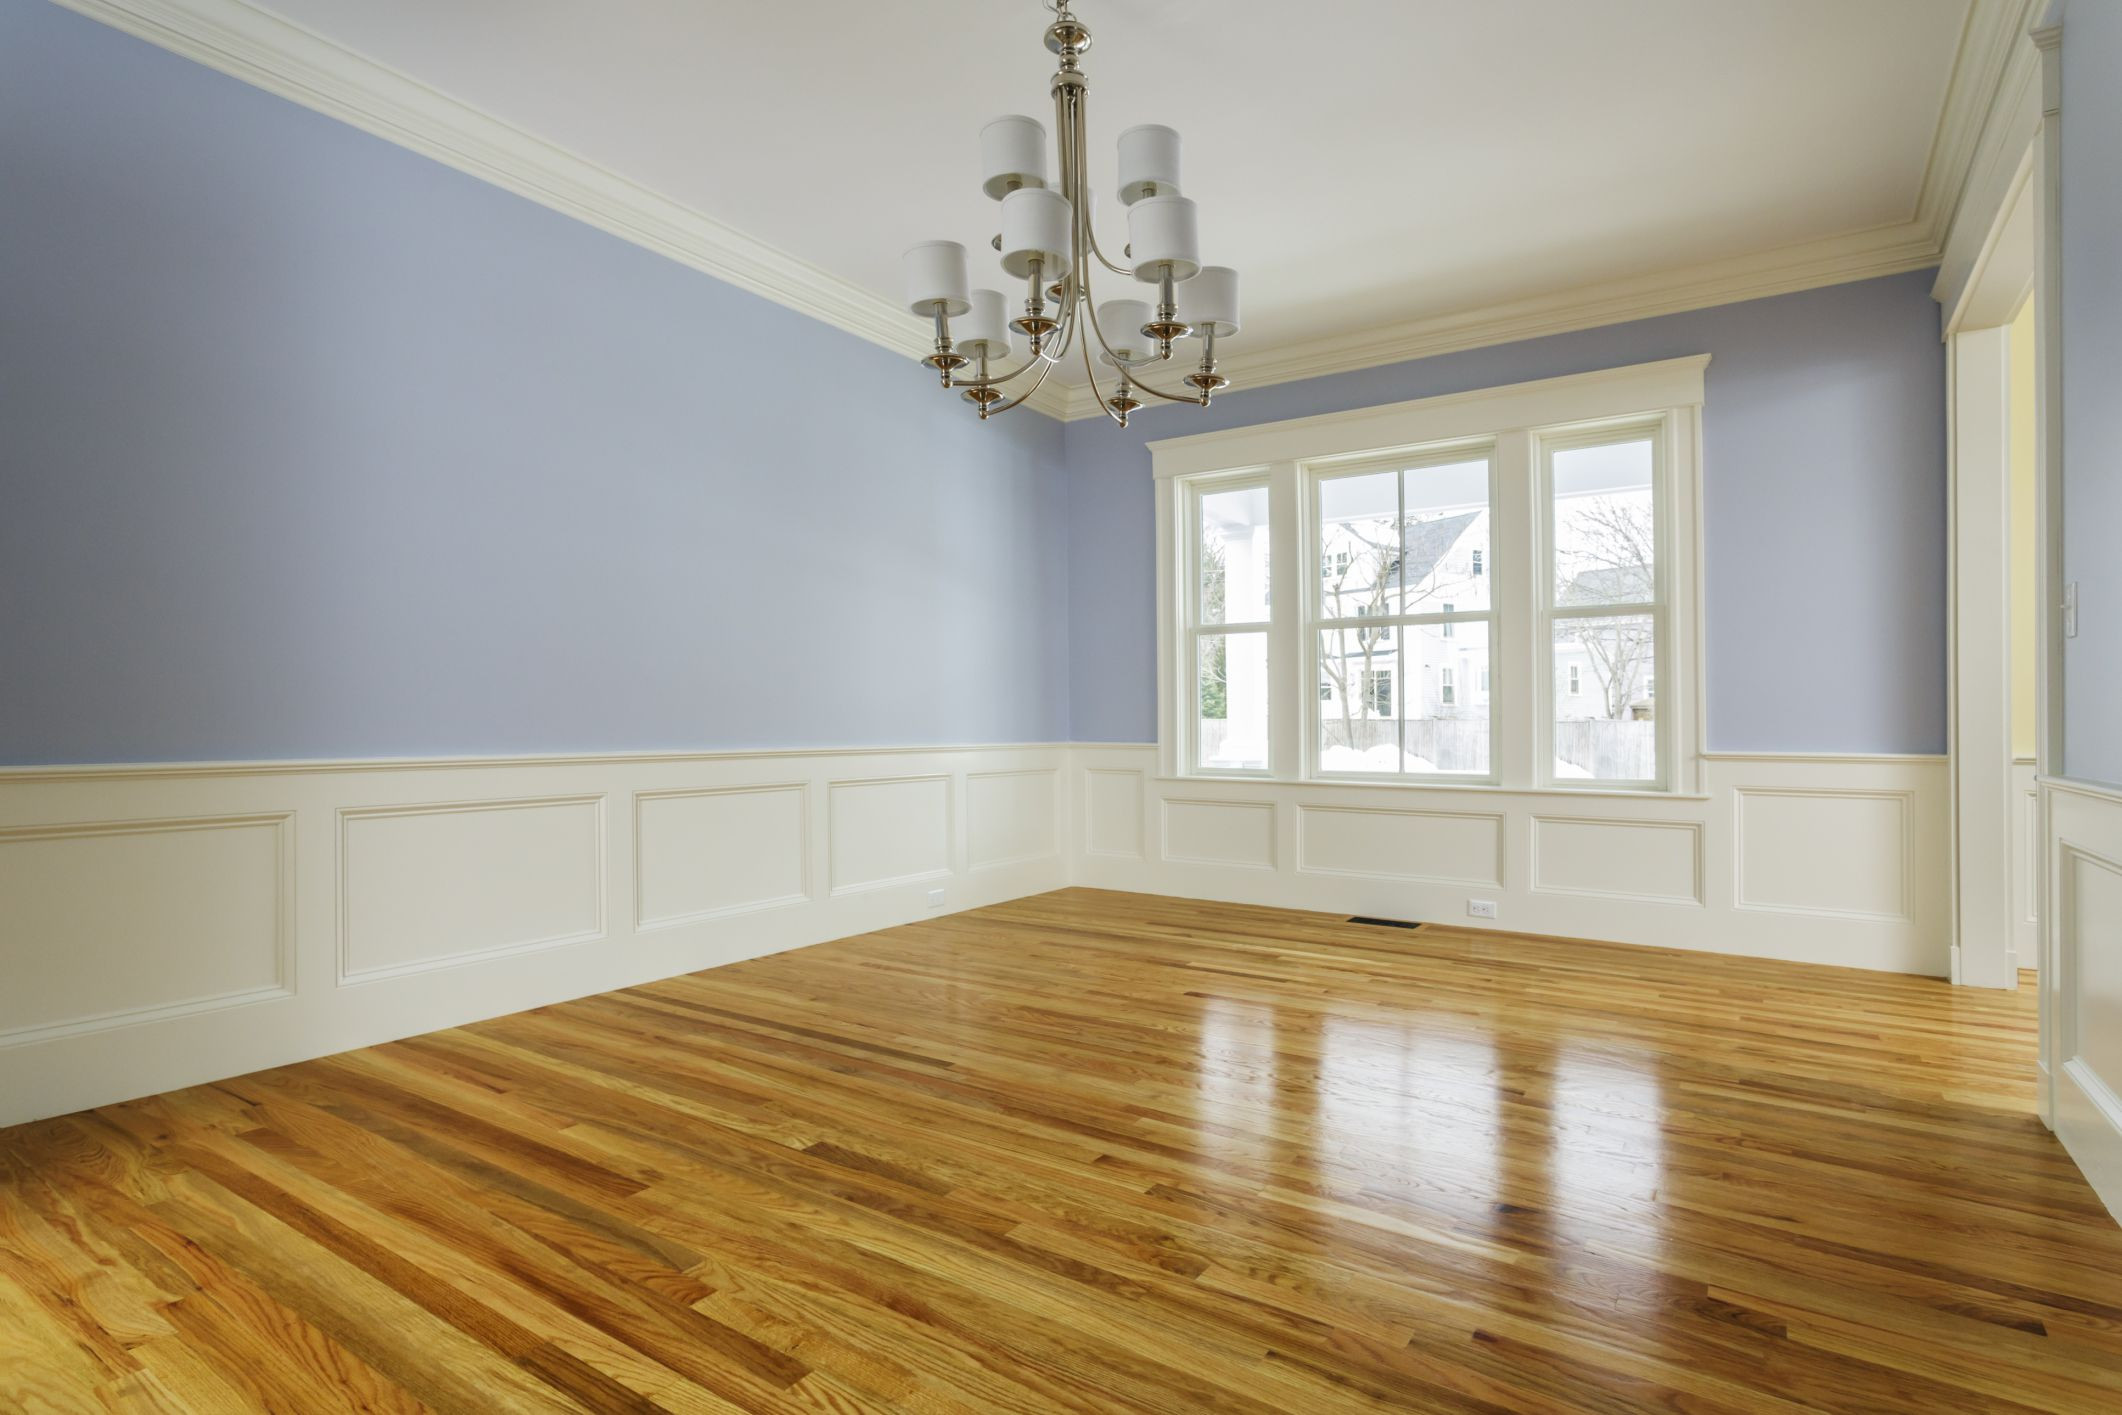 hardwood floor refinishing options of the cost to refinish hardwood floors with regard to 168686572 highres 56a2fd773df78cf7727b6cb3